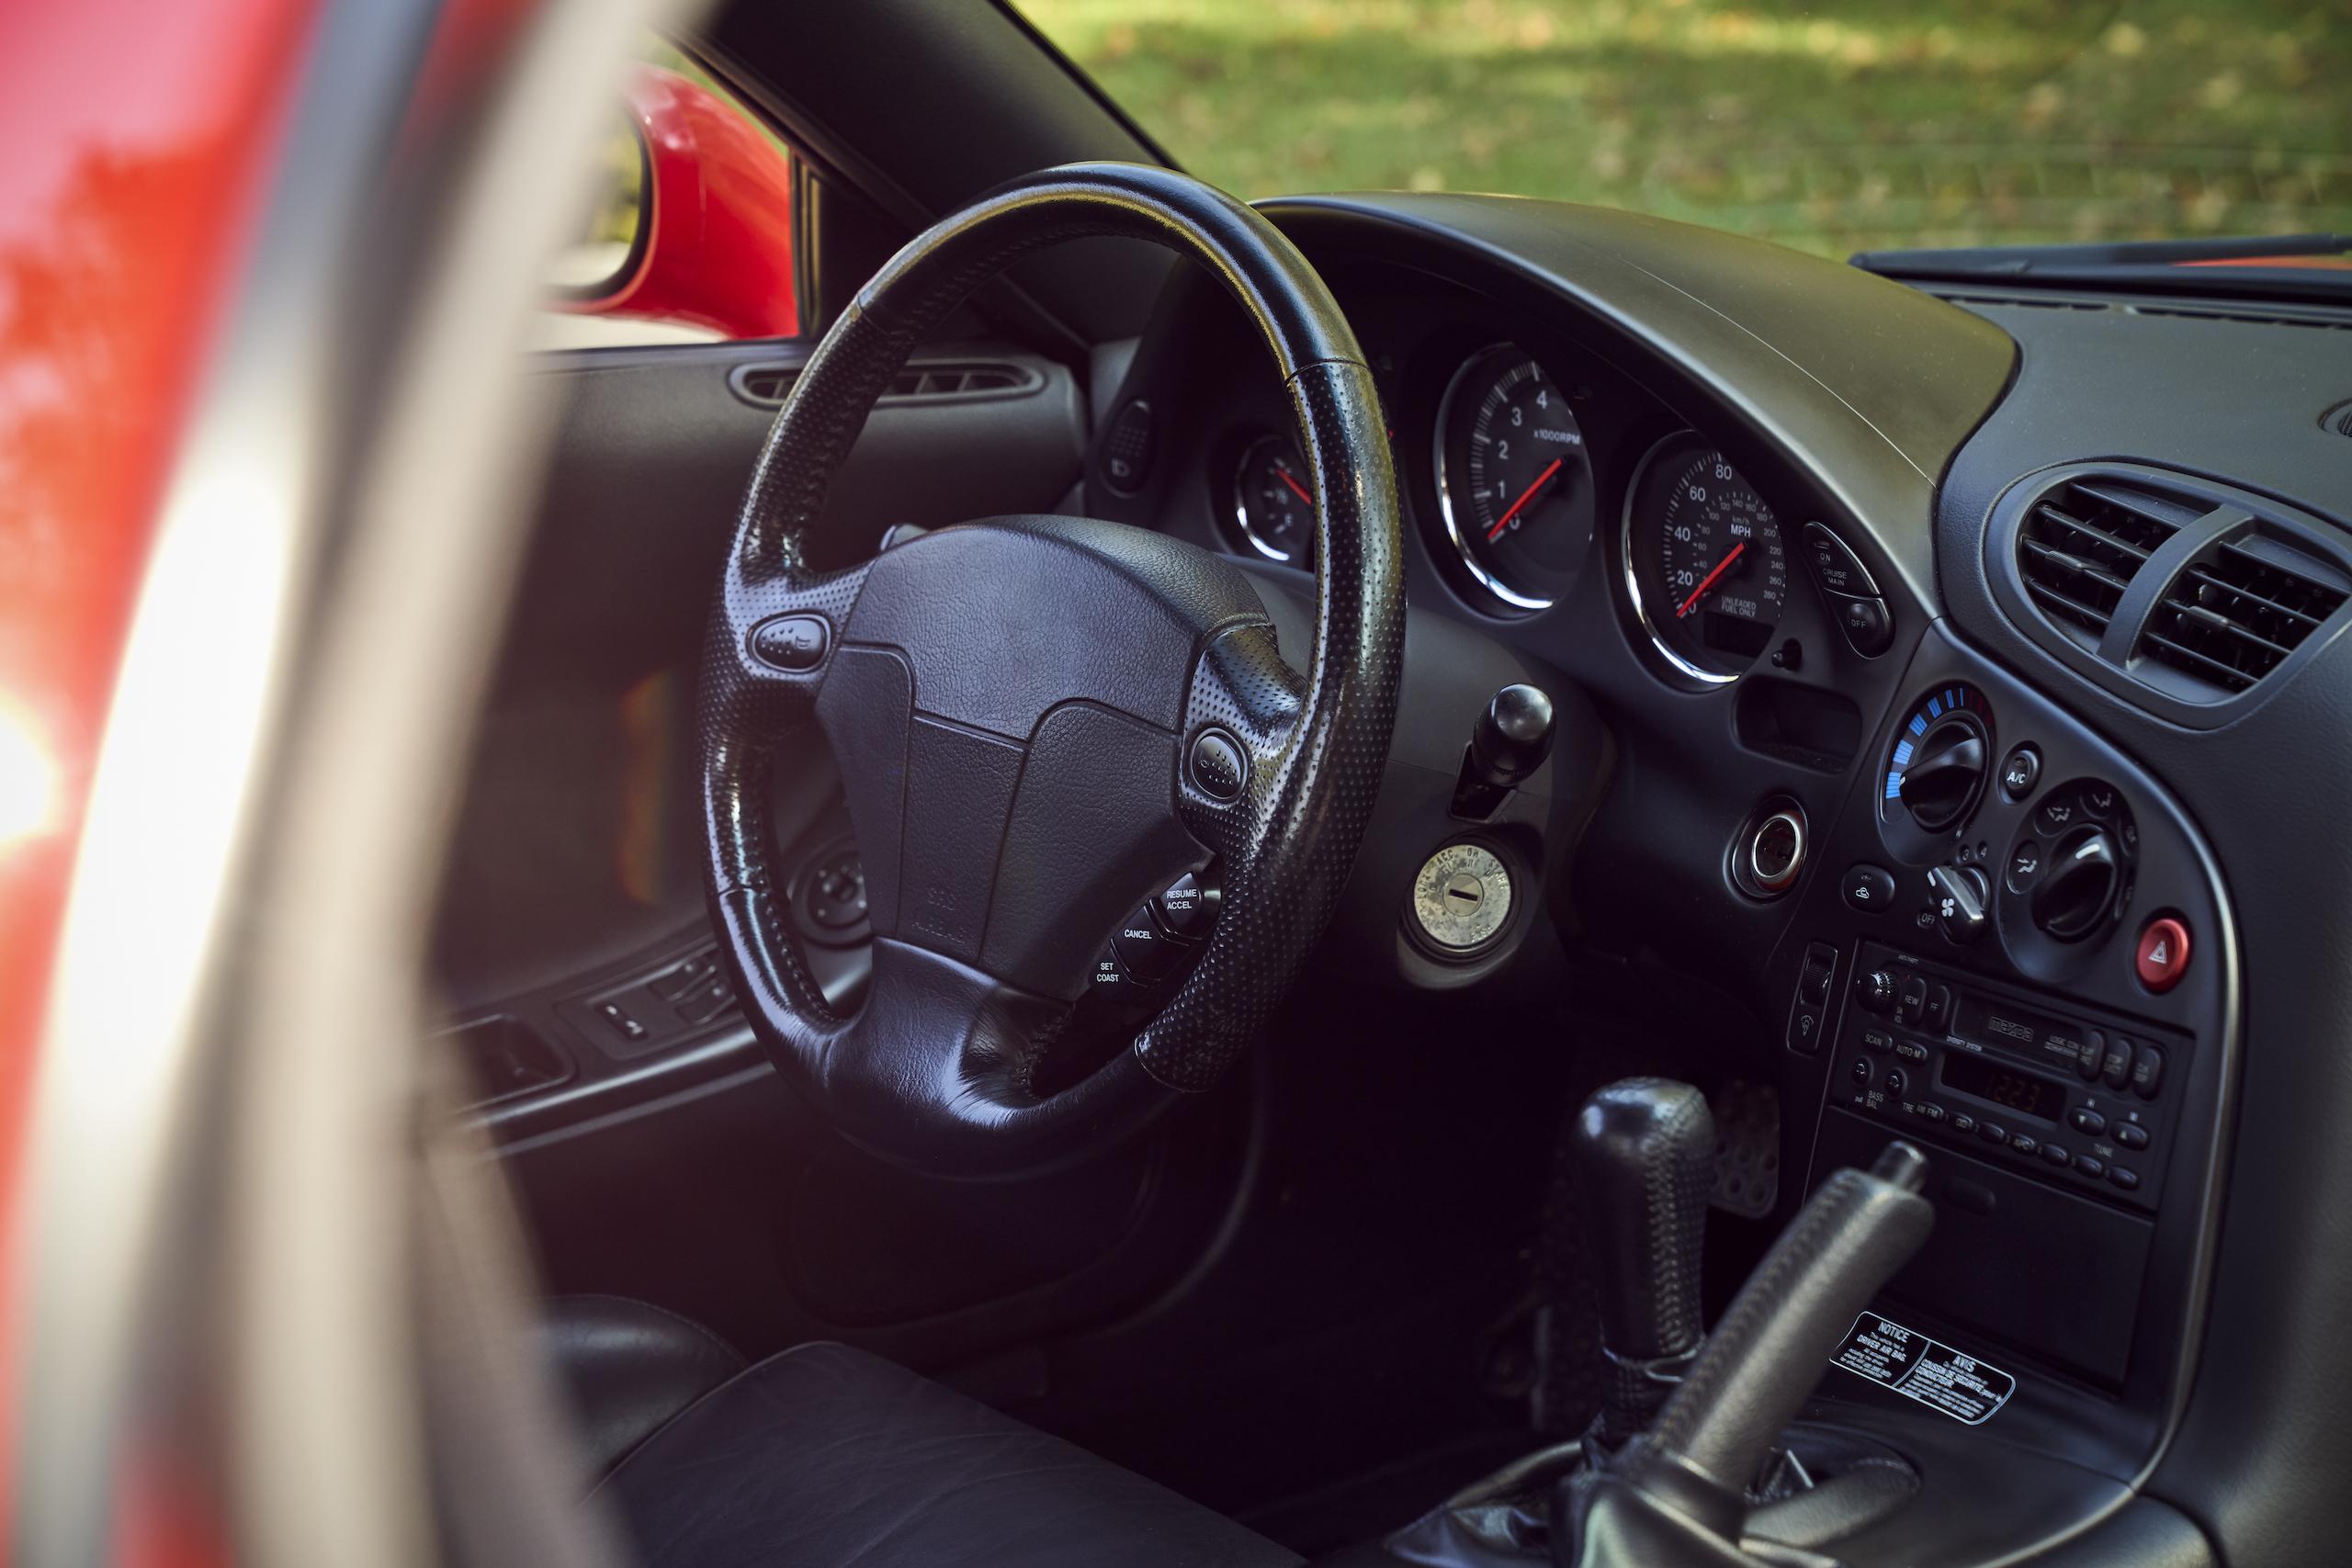 Mazda RX-7 front interior steering wheel